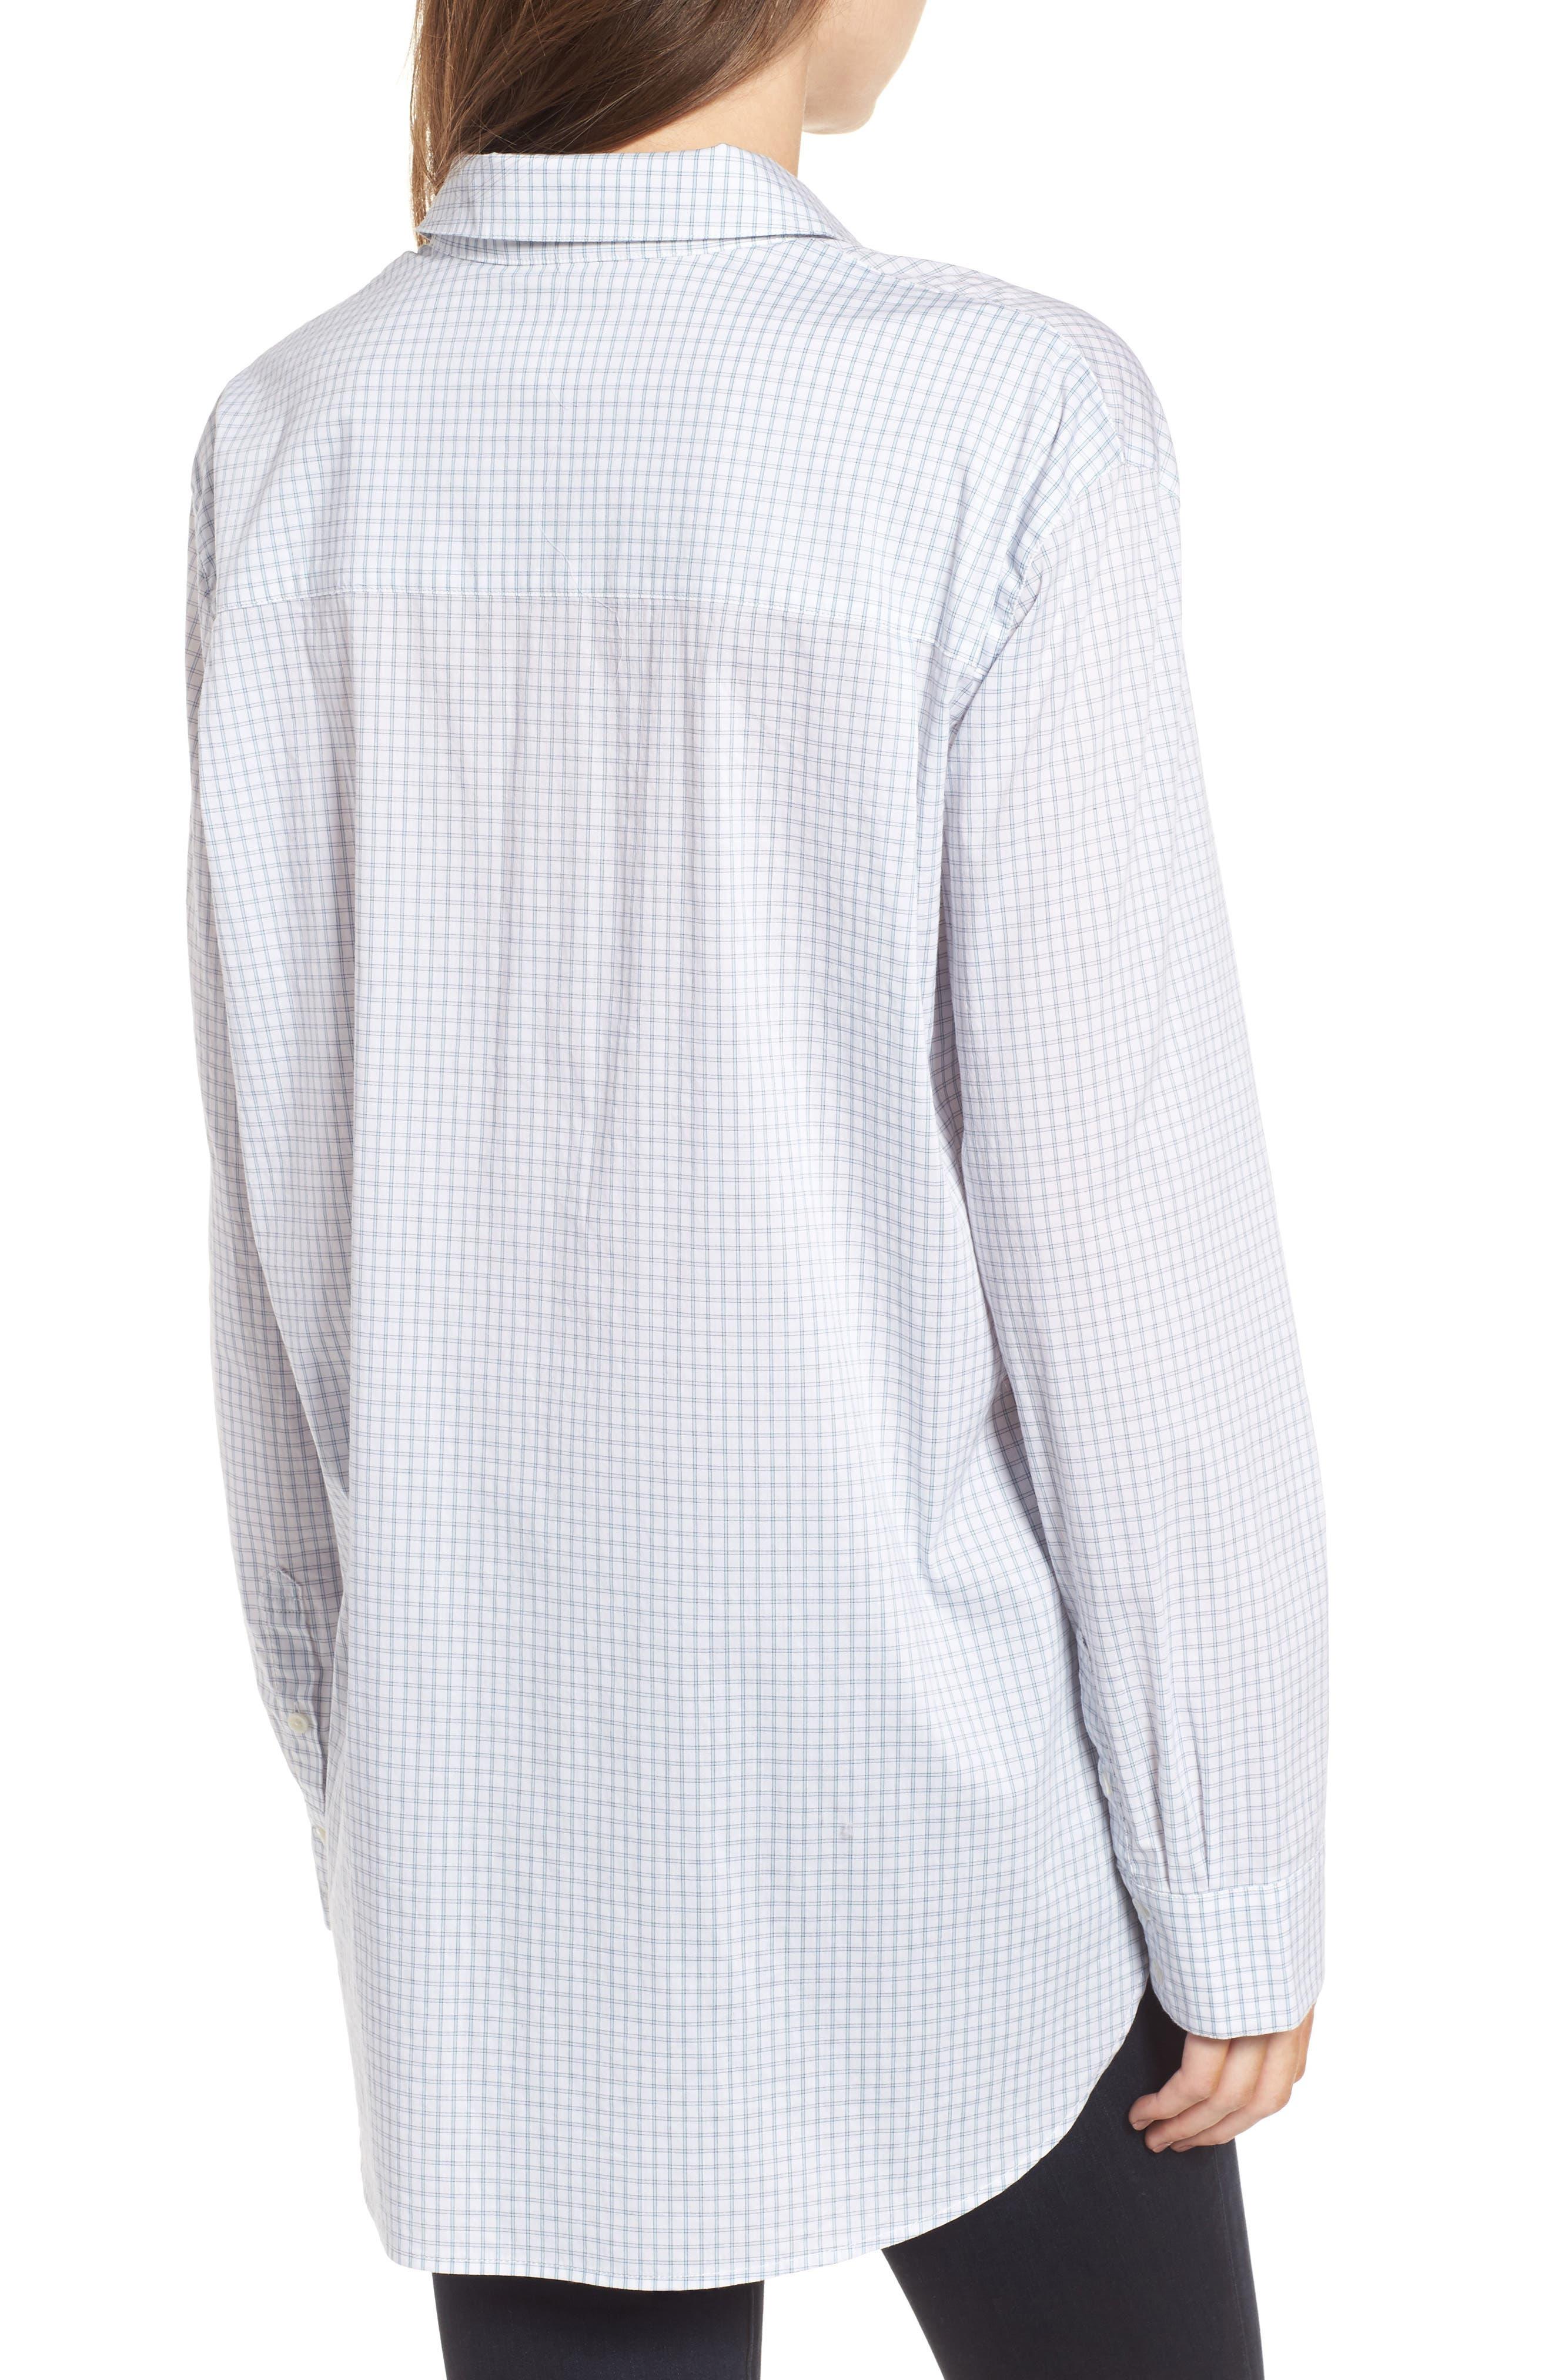 Oversize Check Shirt,                             Alternate thumbnail 2, color,                             100